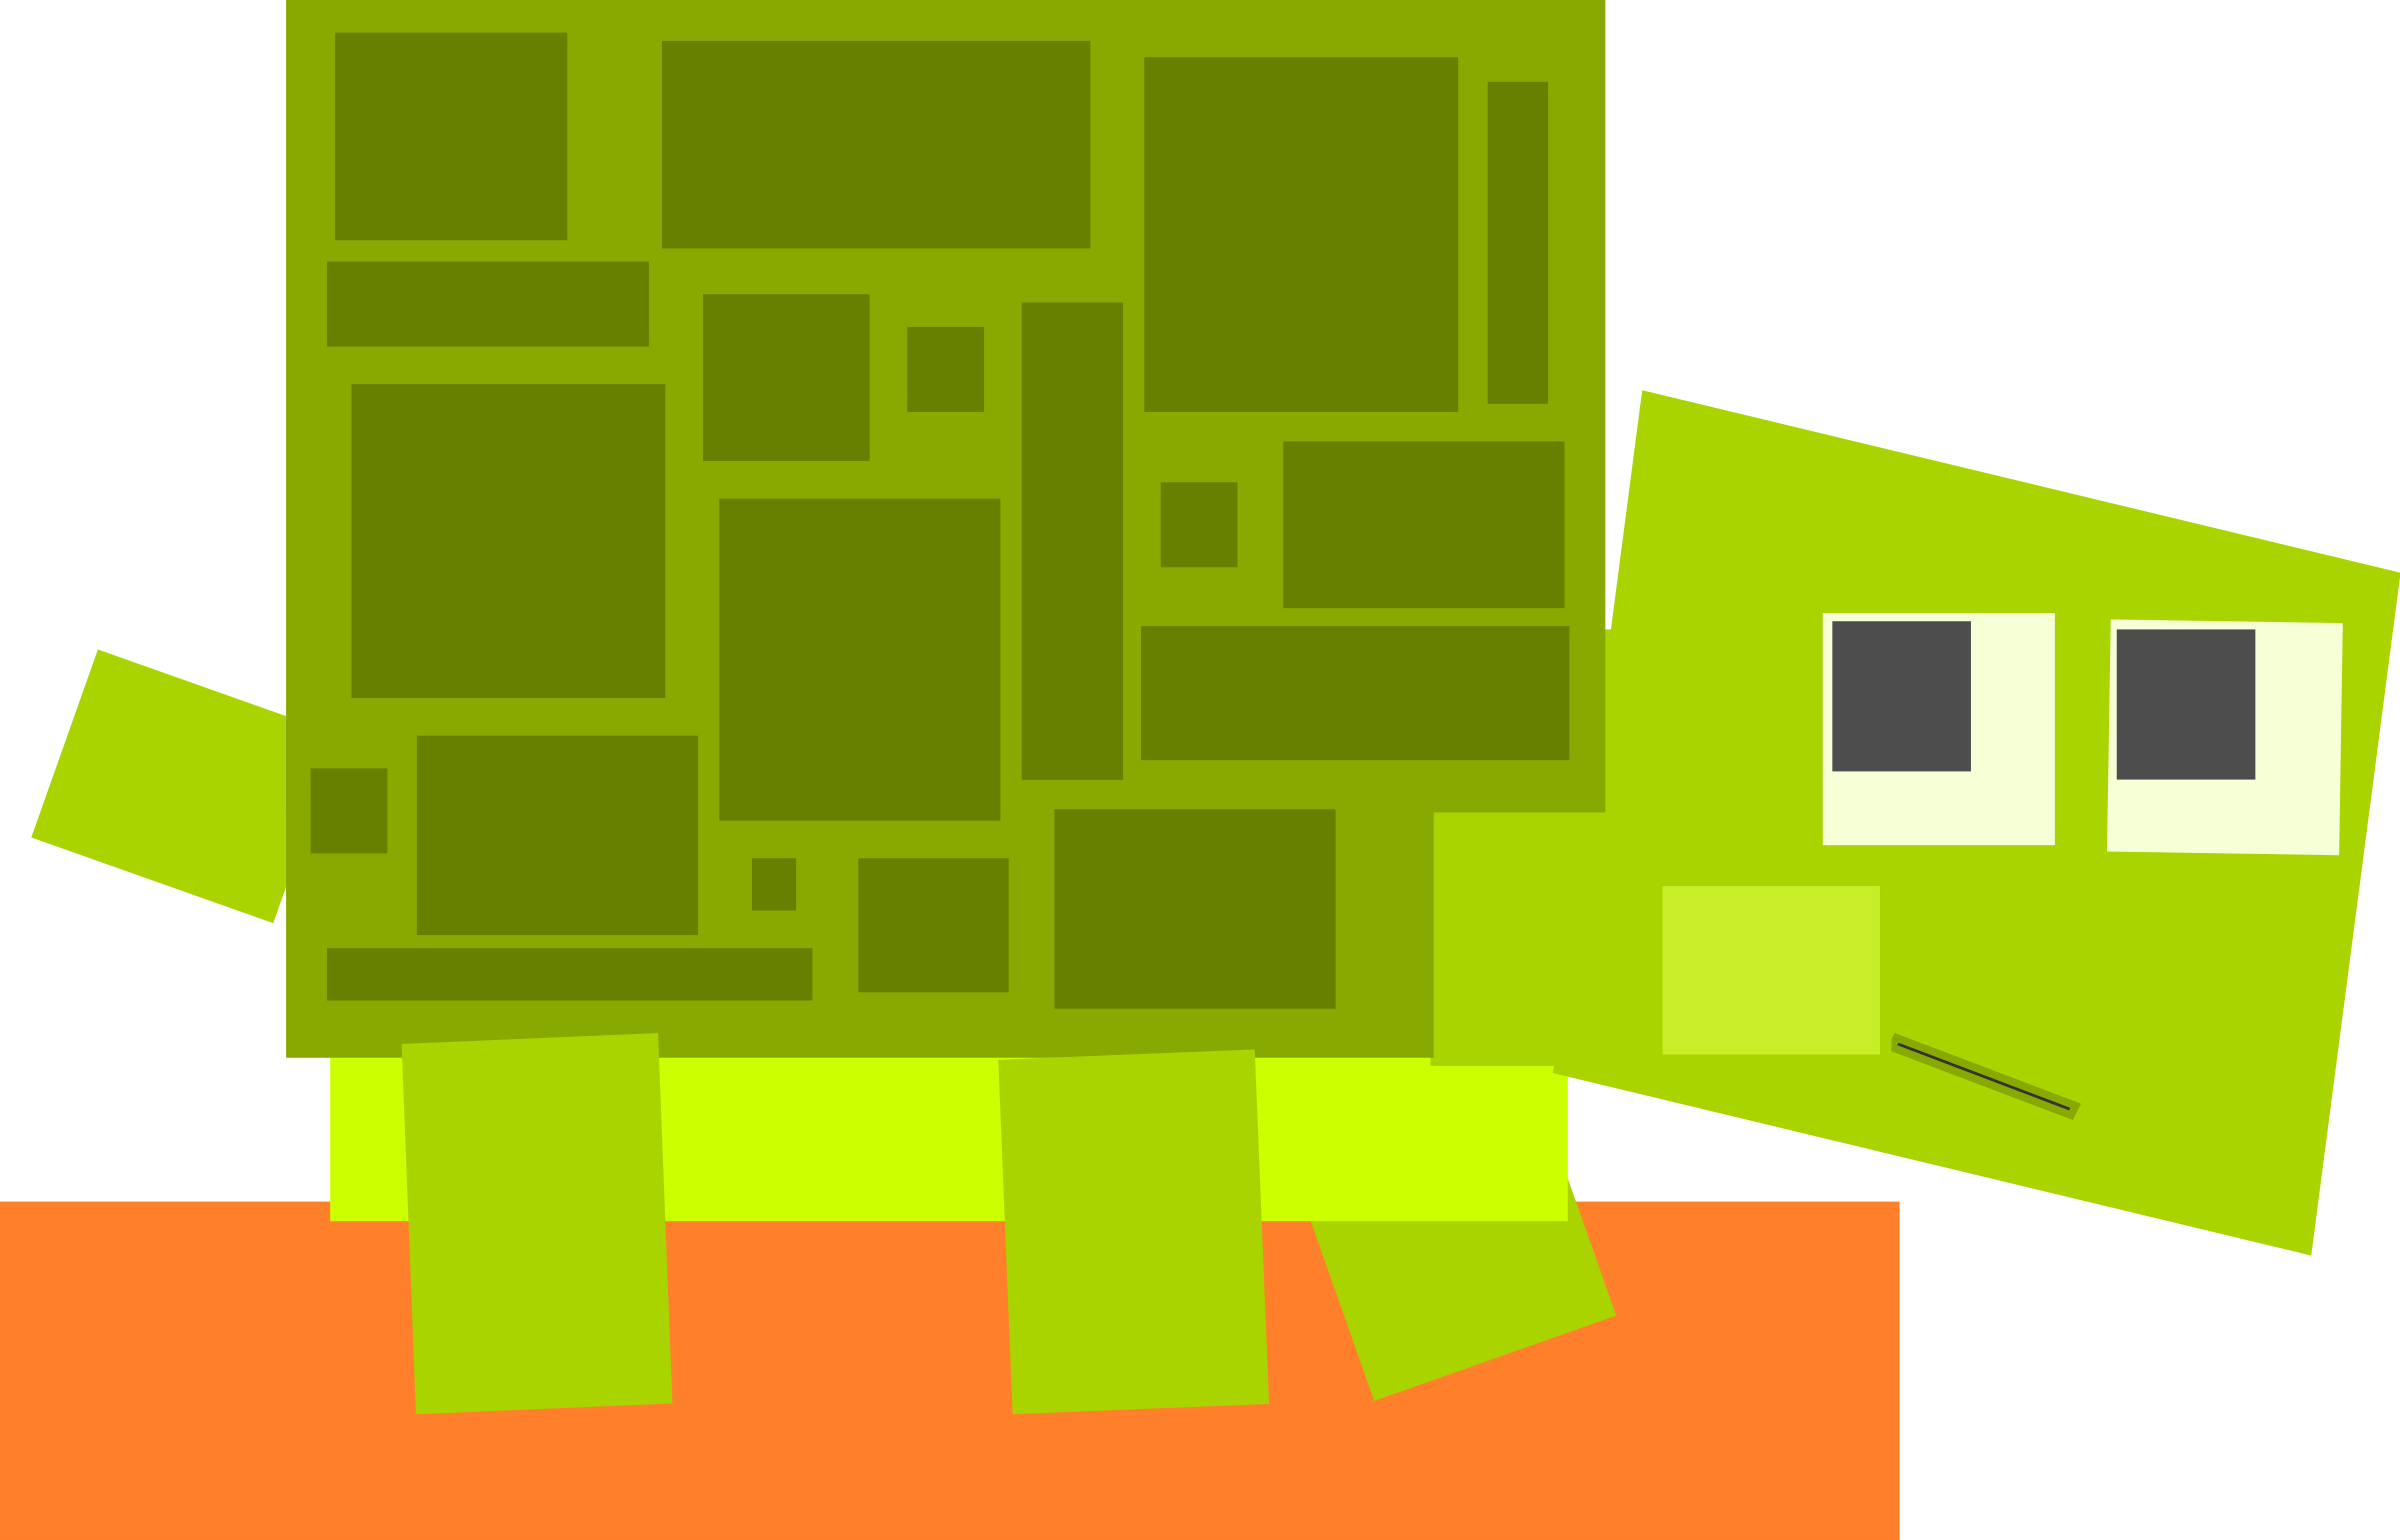 Turtle clipart small #15